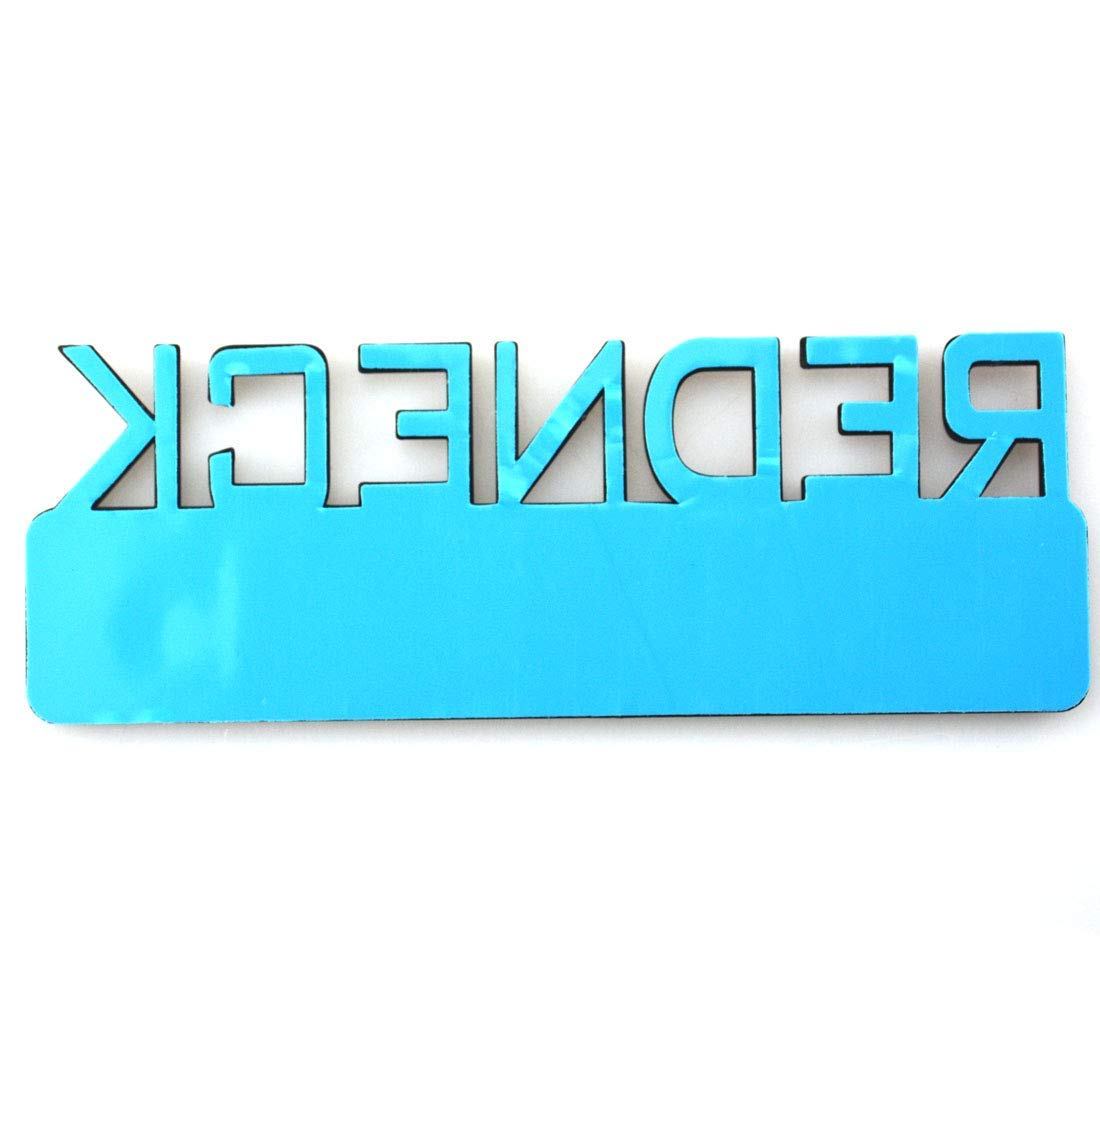 Red//Chrome 1pcs REDNECK EDITION CAR EMBLEM Chrome Badge 3D Sticker Decal Compatible with F-150 F250 F350 Silverado RAM 1500